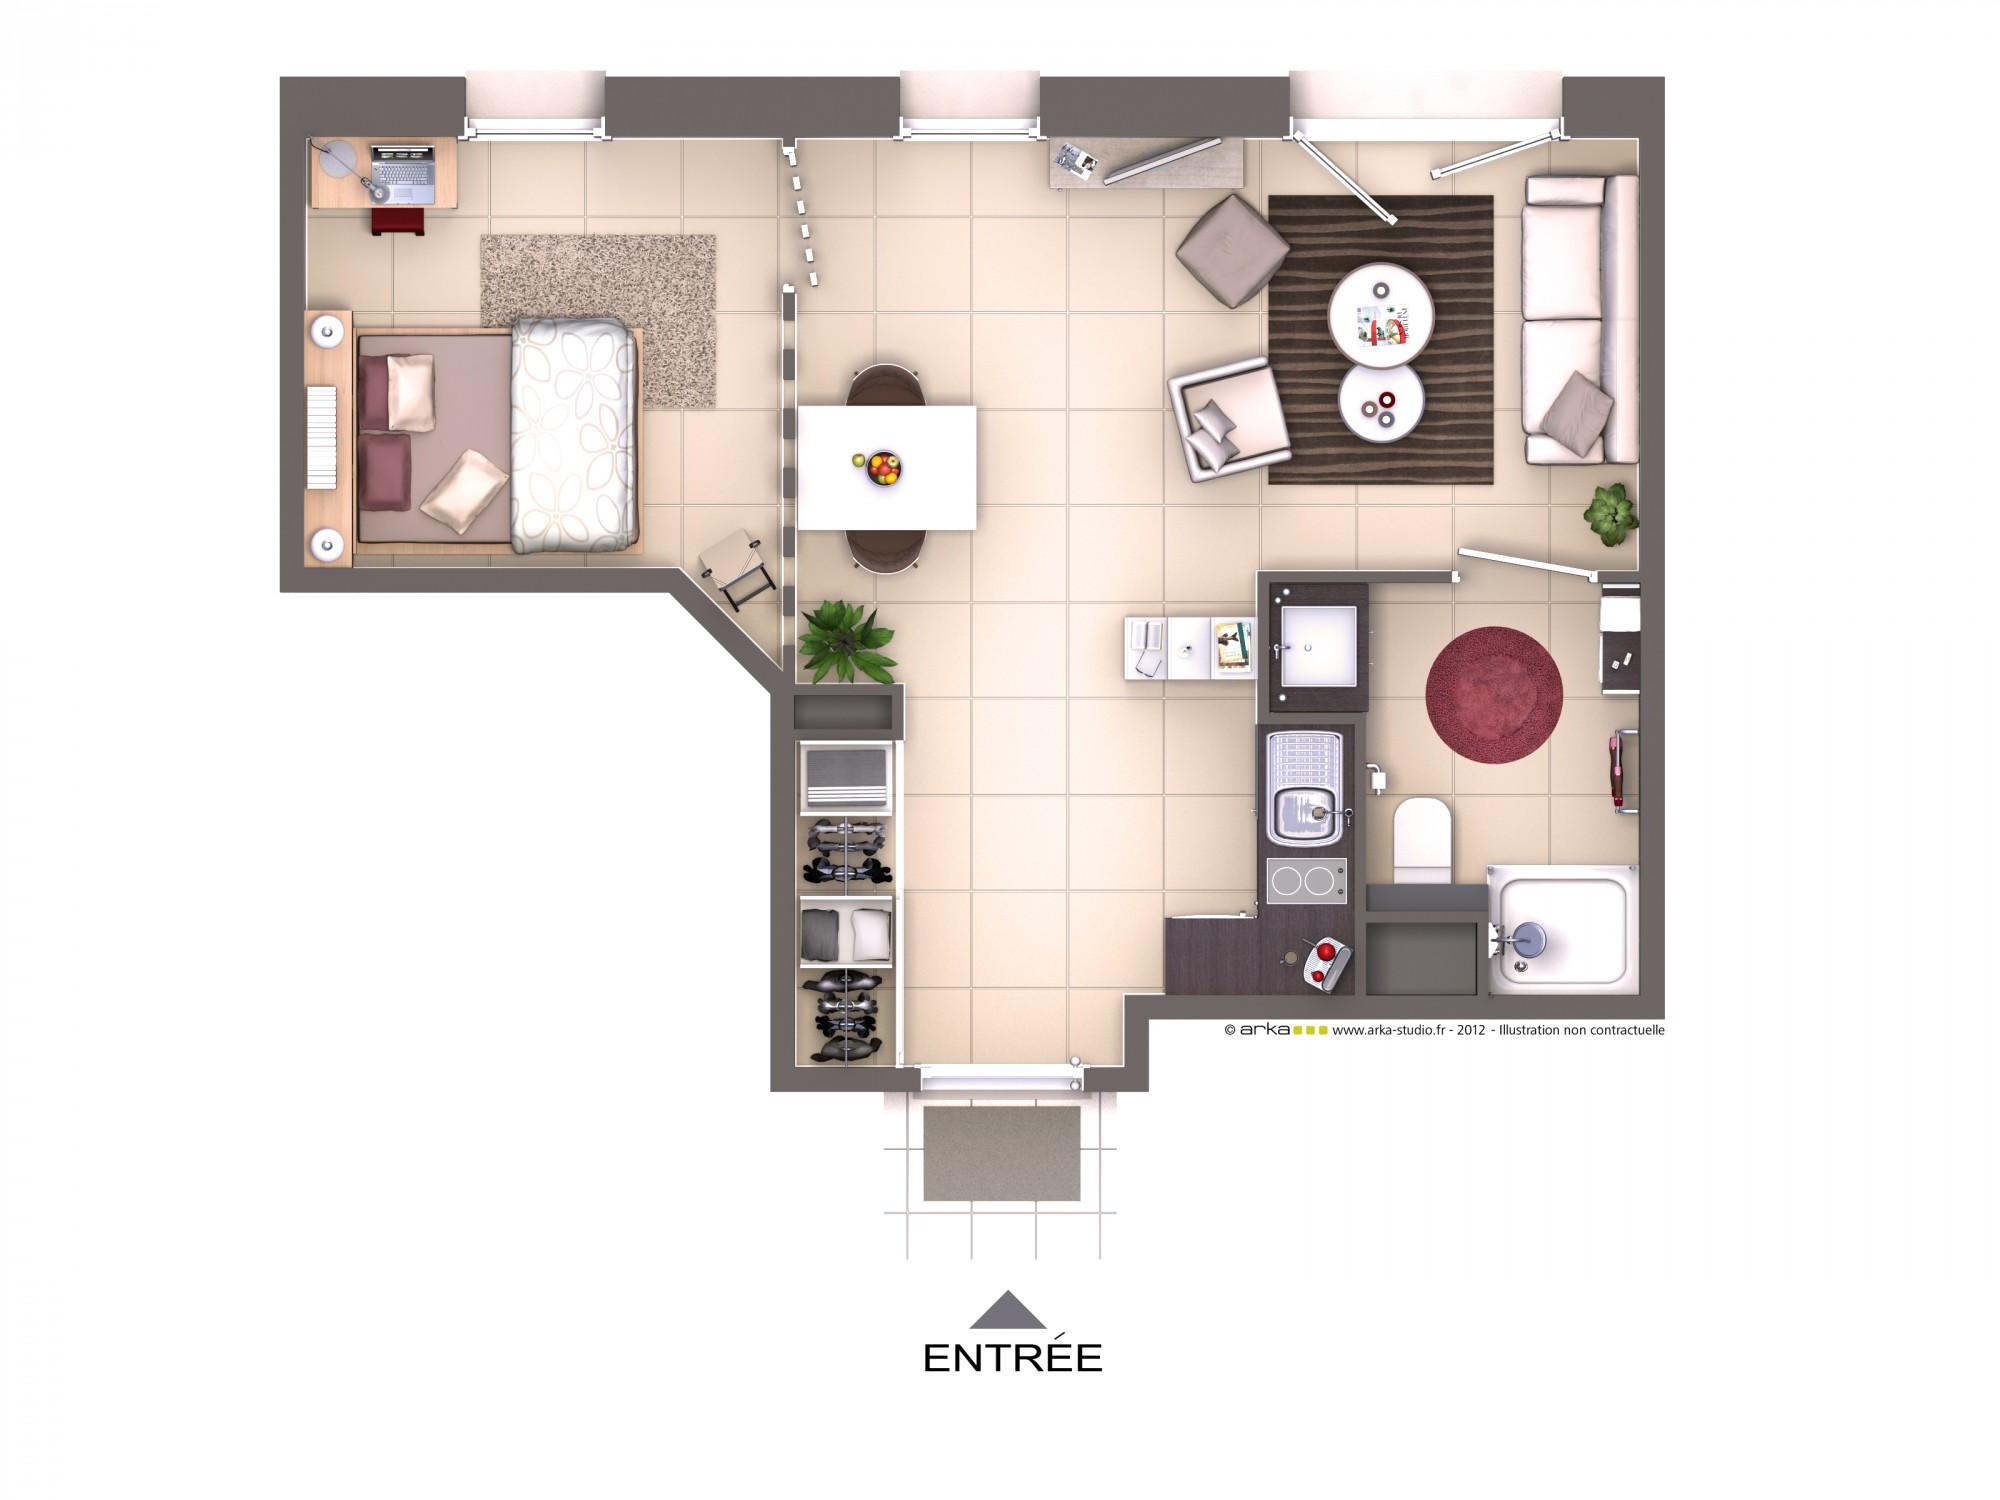 location appartement un jardin sur la terre lyon